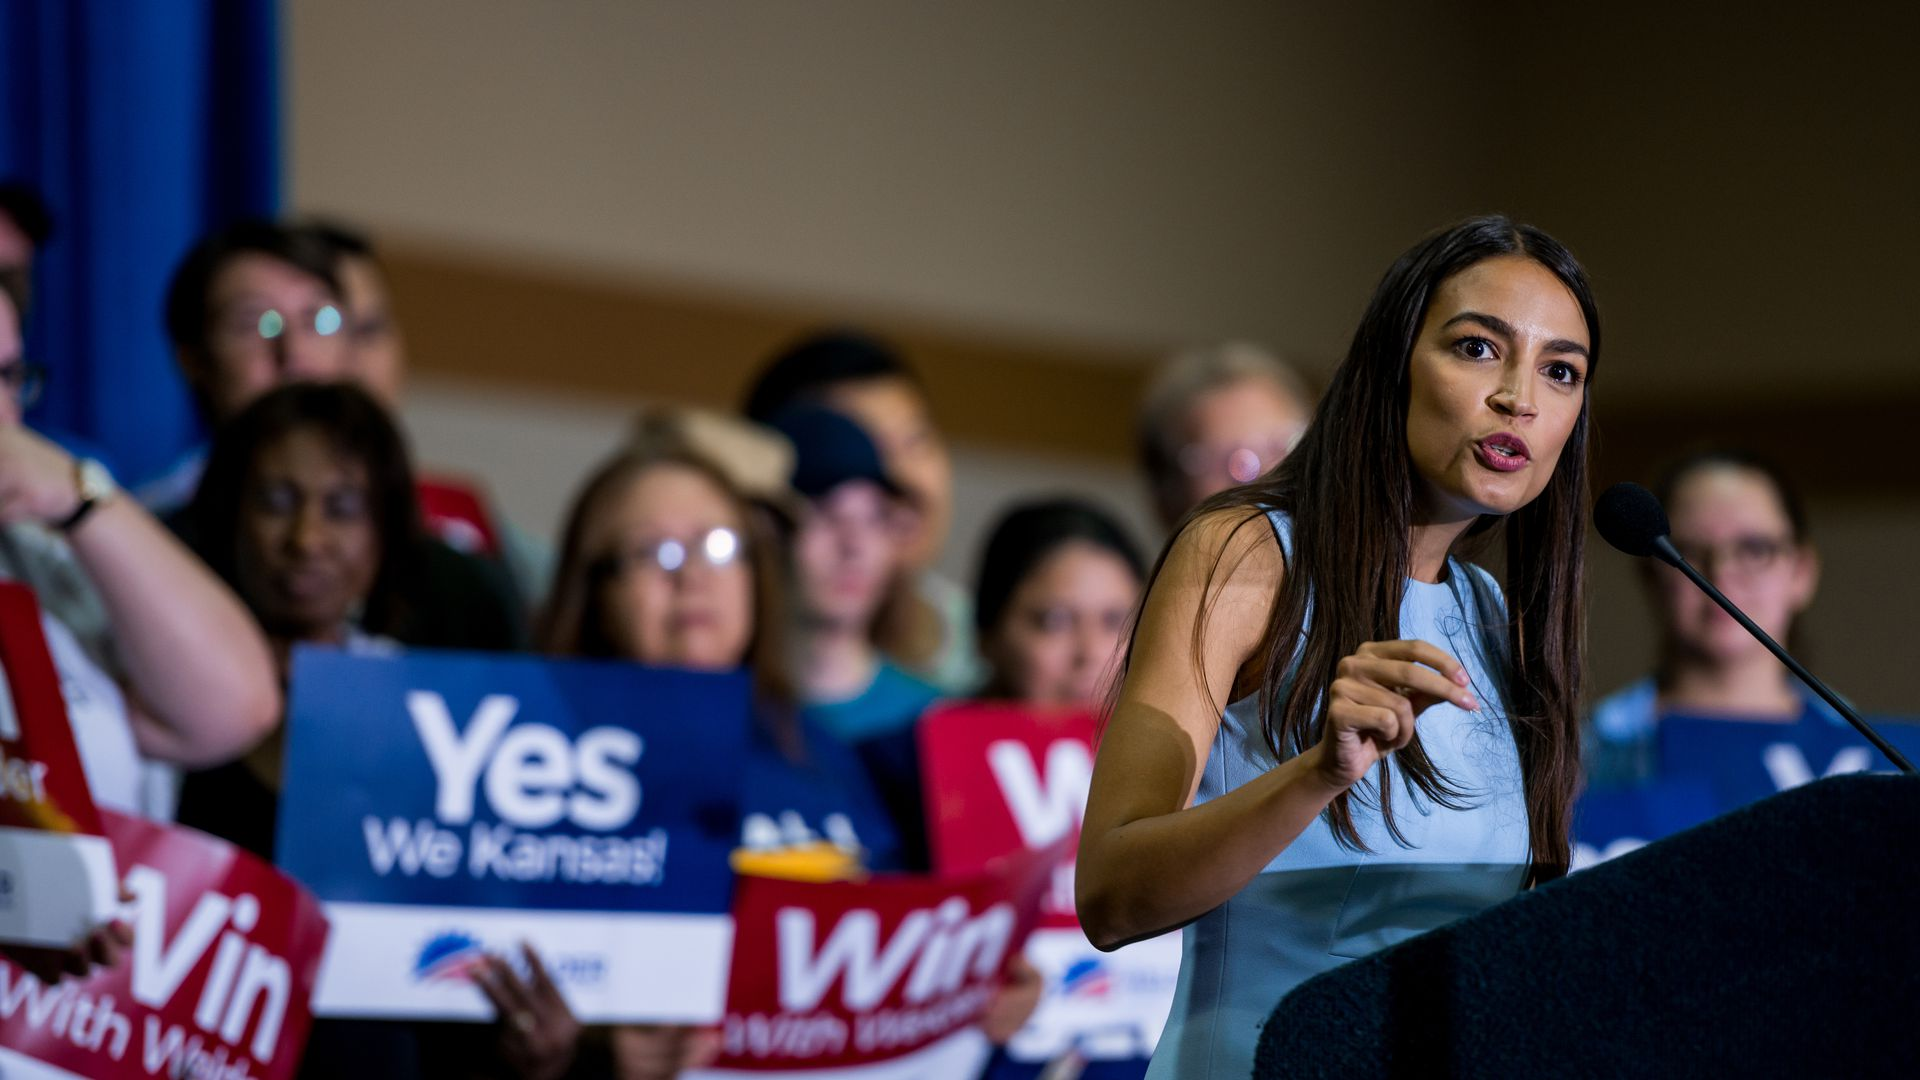 Alexandria Ocasio-Cortez speaking at a rally in Kansas